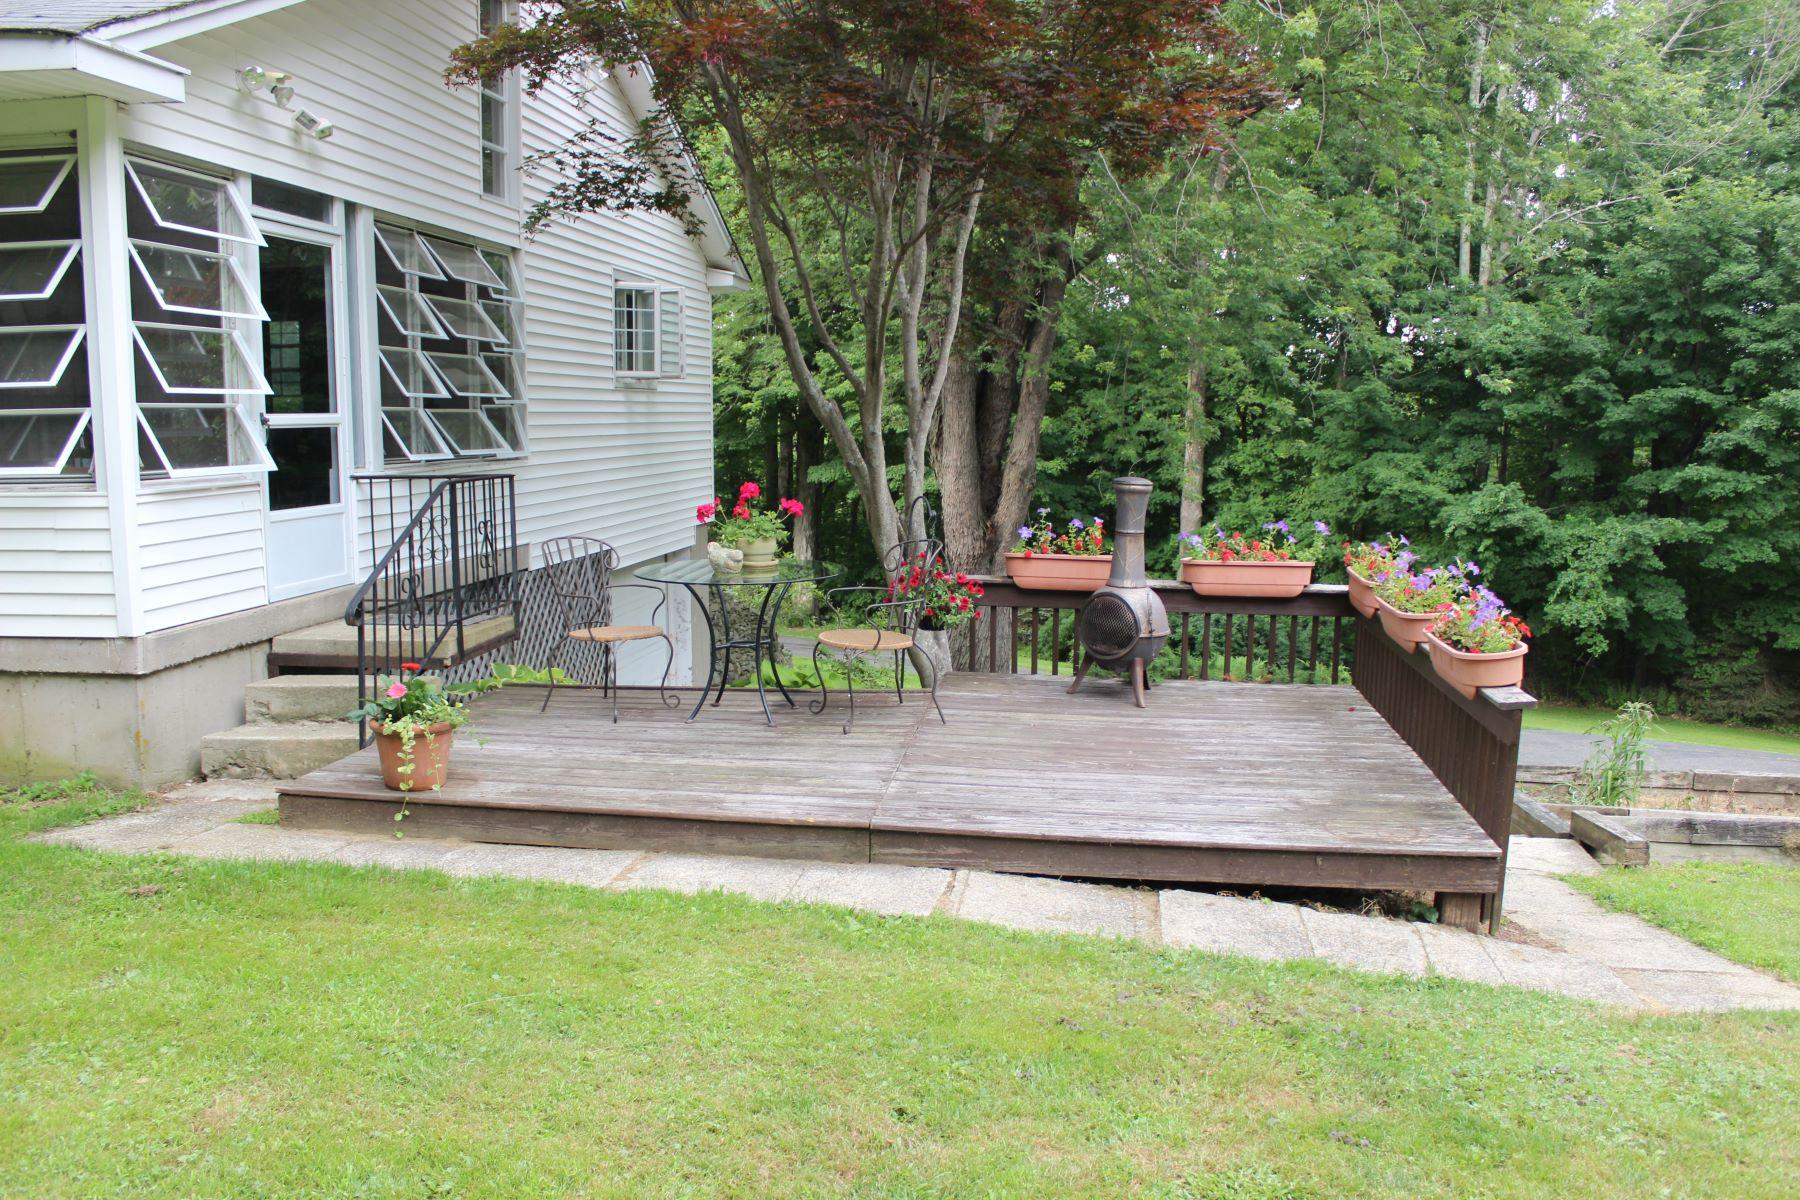 Single Family Homes للـ Sale في Adorable ranch on cul-de-sac 25 Little Rd, Morris, Connecticut 06763 United States